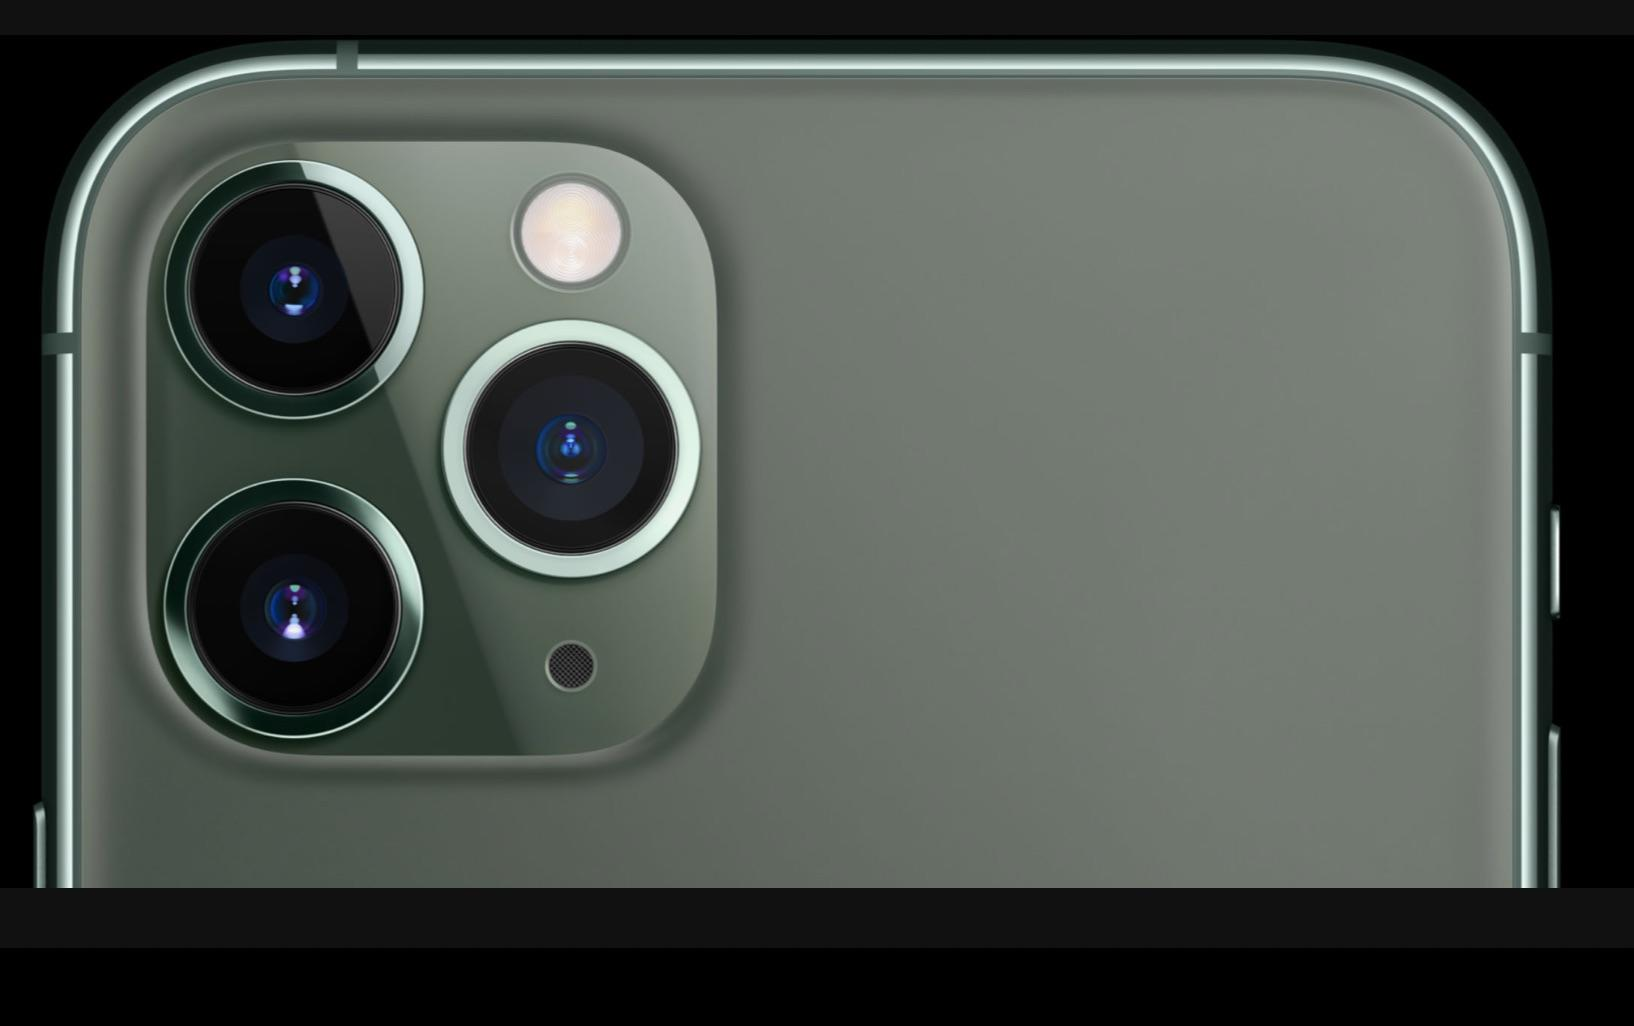 http://thedigitalstory.com/2019/09/17/triple-camera-iphone.jpg